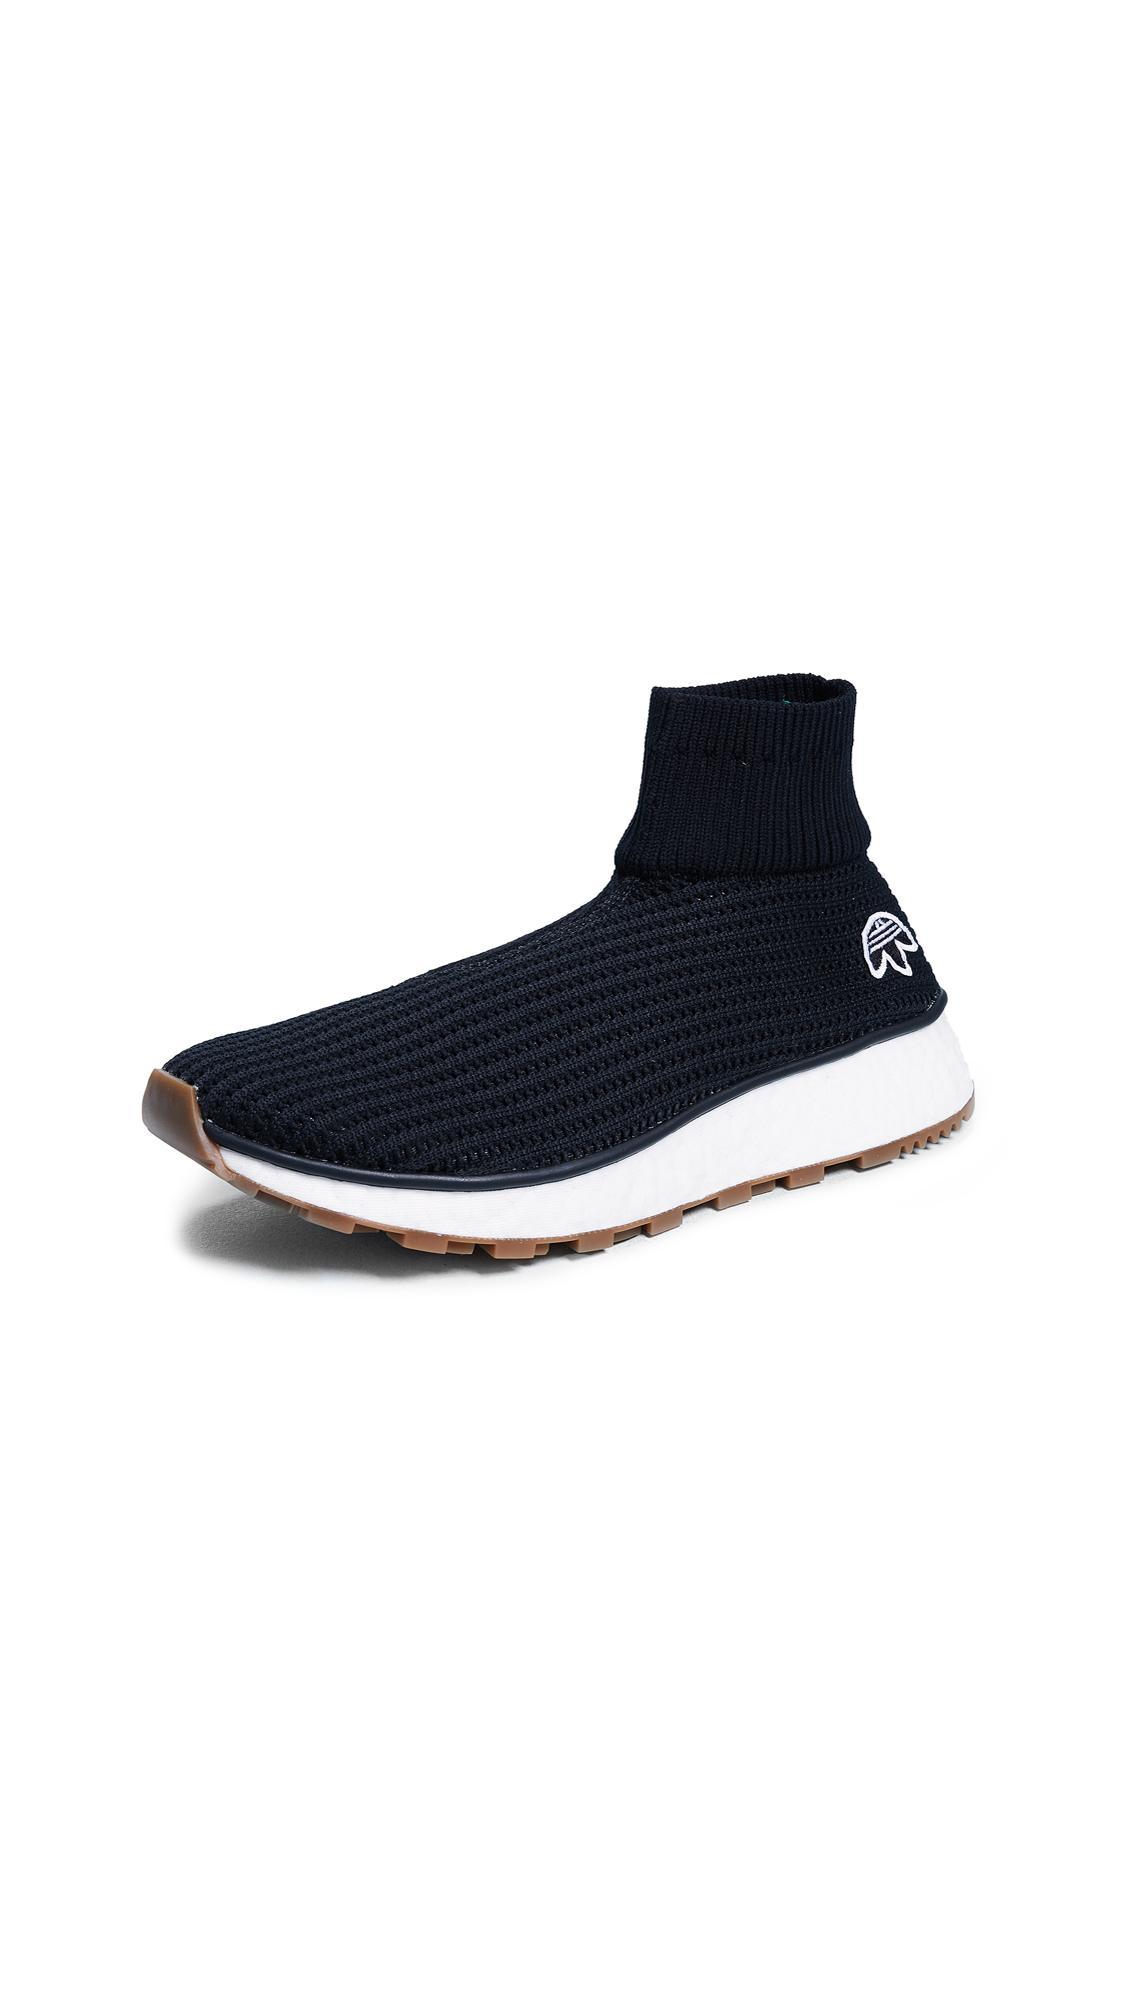 super popular 580e9 00ac9 Adidas Originals By Alexander Wang Aw Run Clean Joggers In Core BlackCore  Black